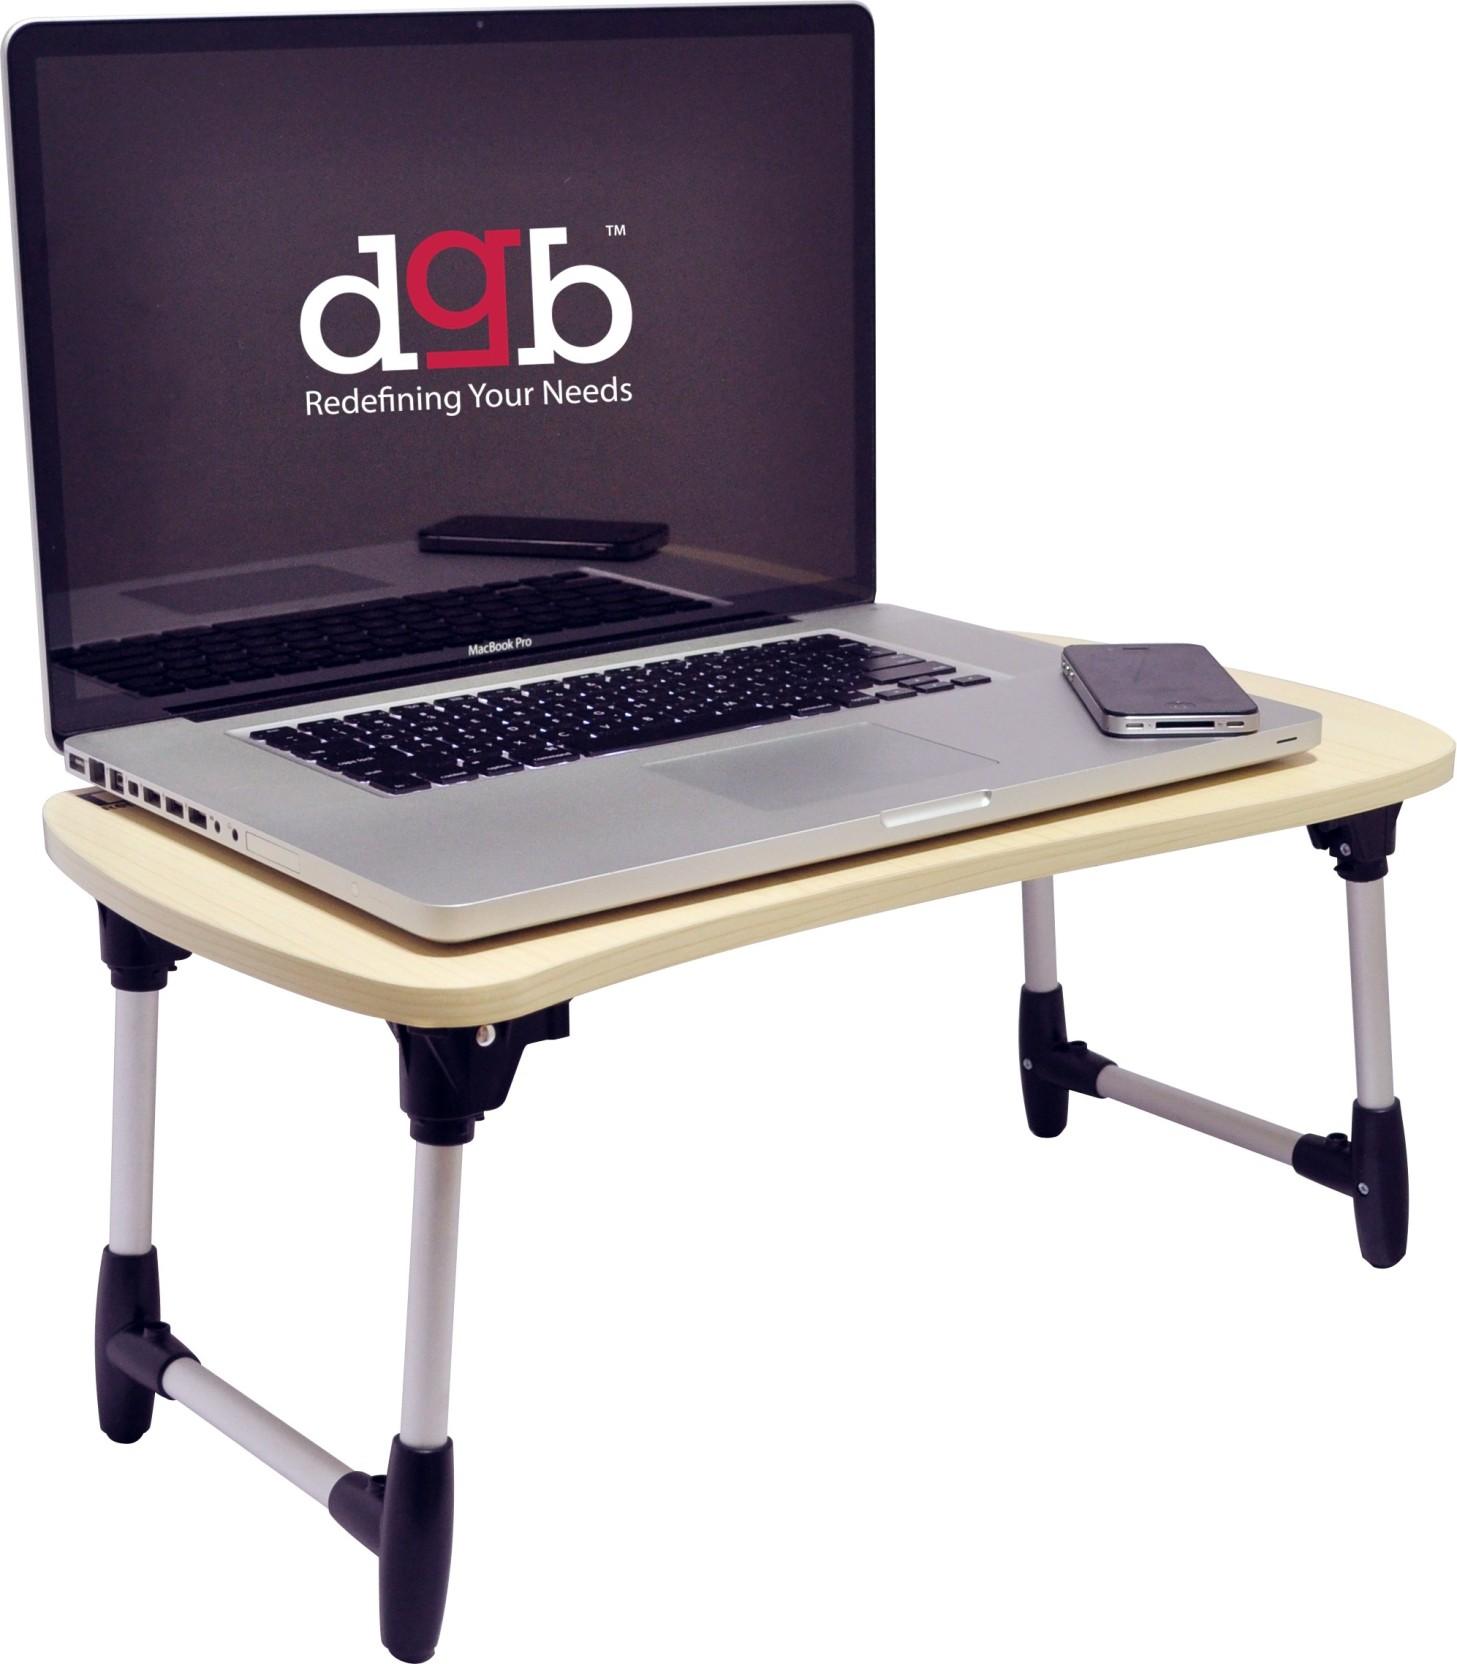 Dgb Laptab Ld2013 Multi Functional Table Cooling Pad Coolerpad Nc 32 Kipas Laptop Add To Cart